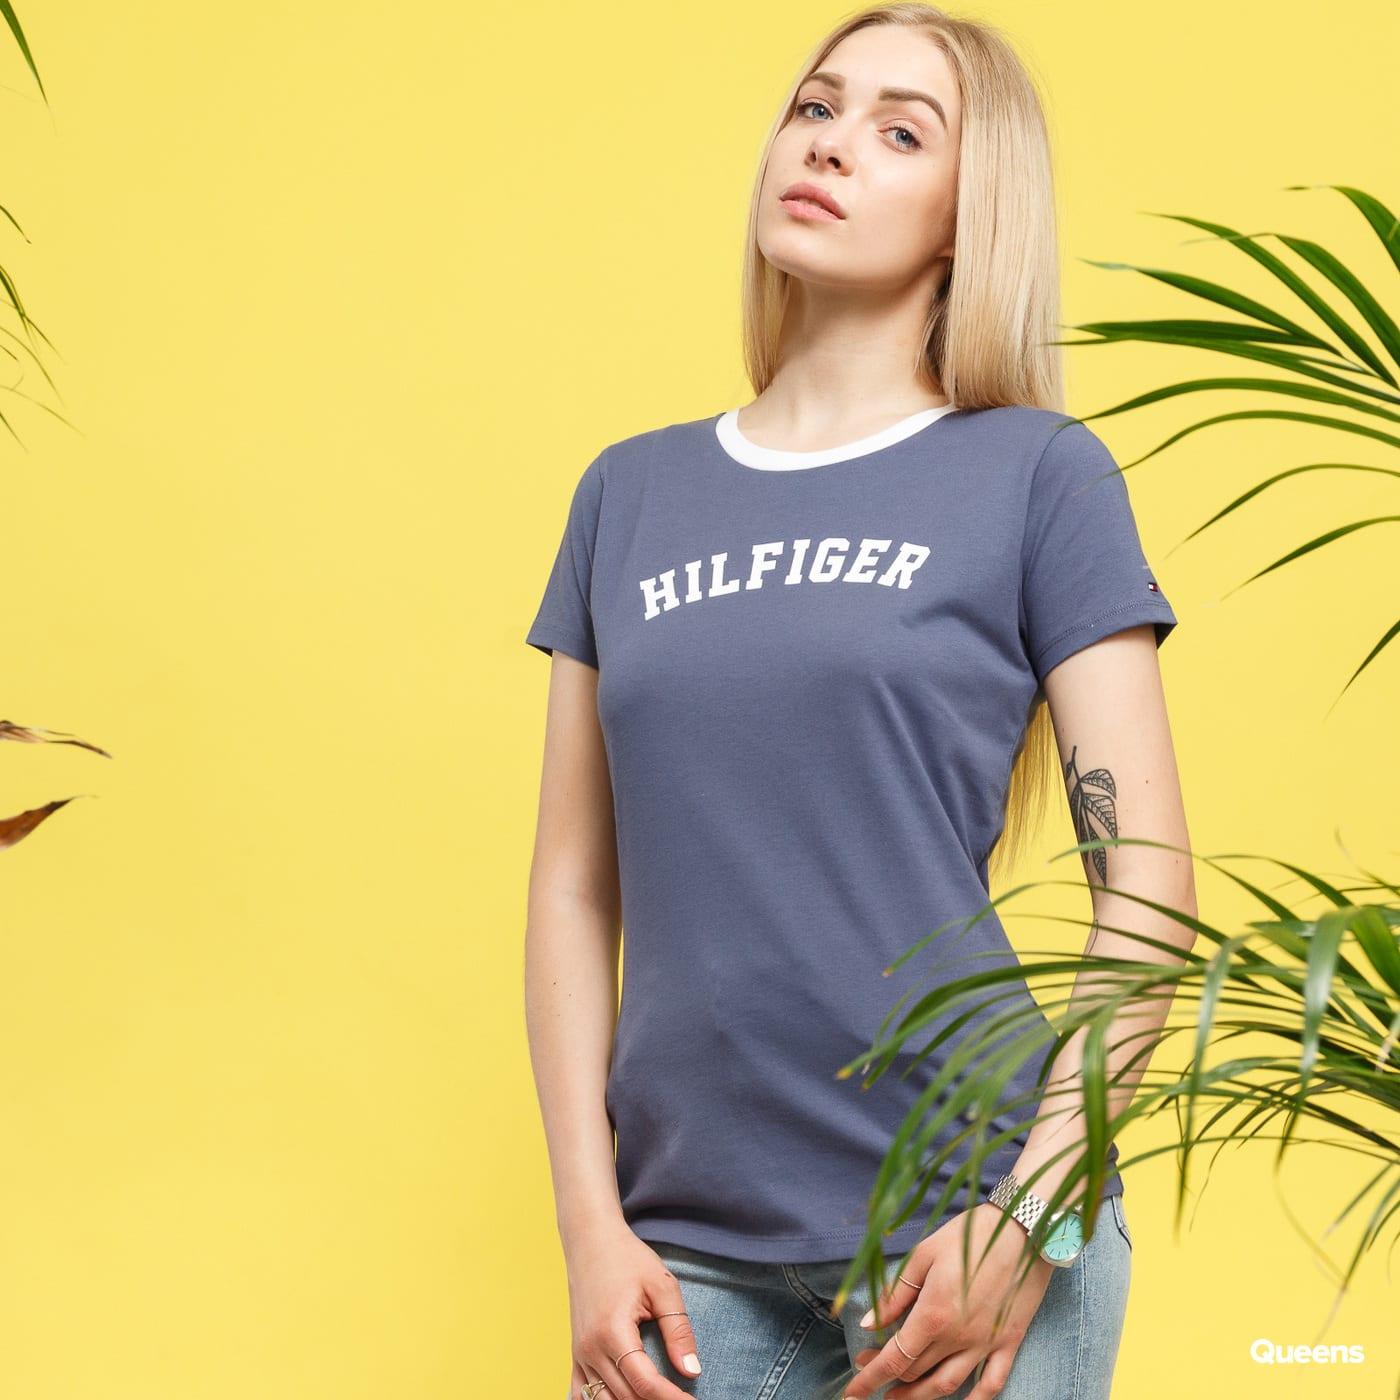 Dámské tričko Tommy Hilfiger SS Tee Print (UW0UW00091 418) – Queens 💚 e572746579a